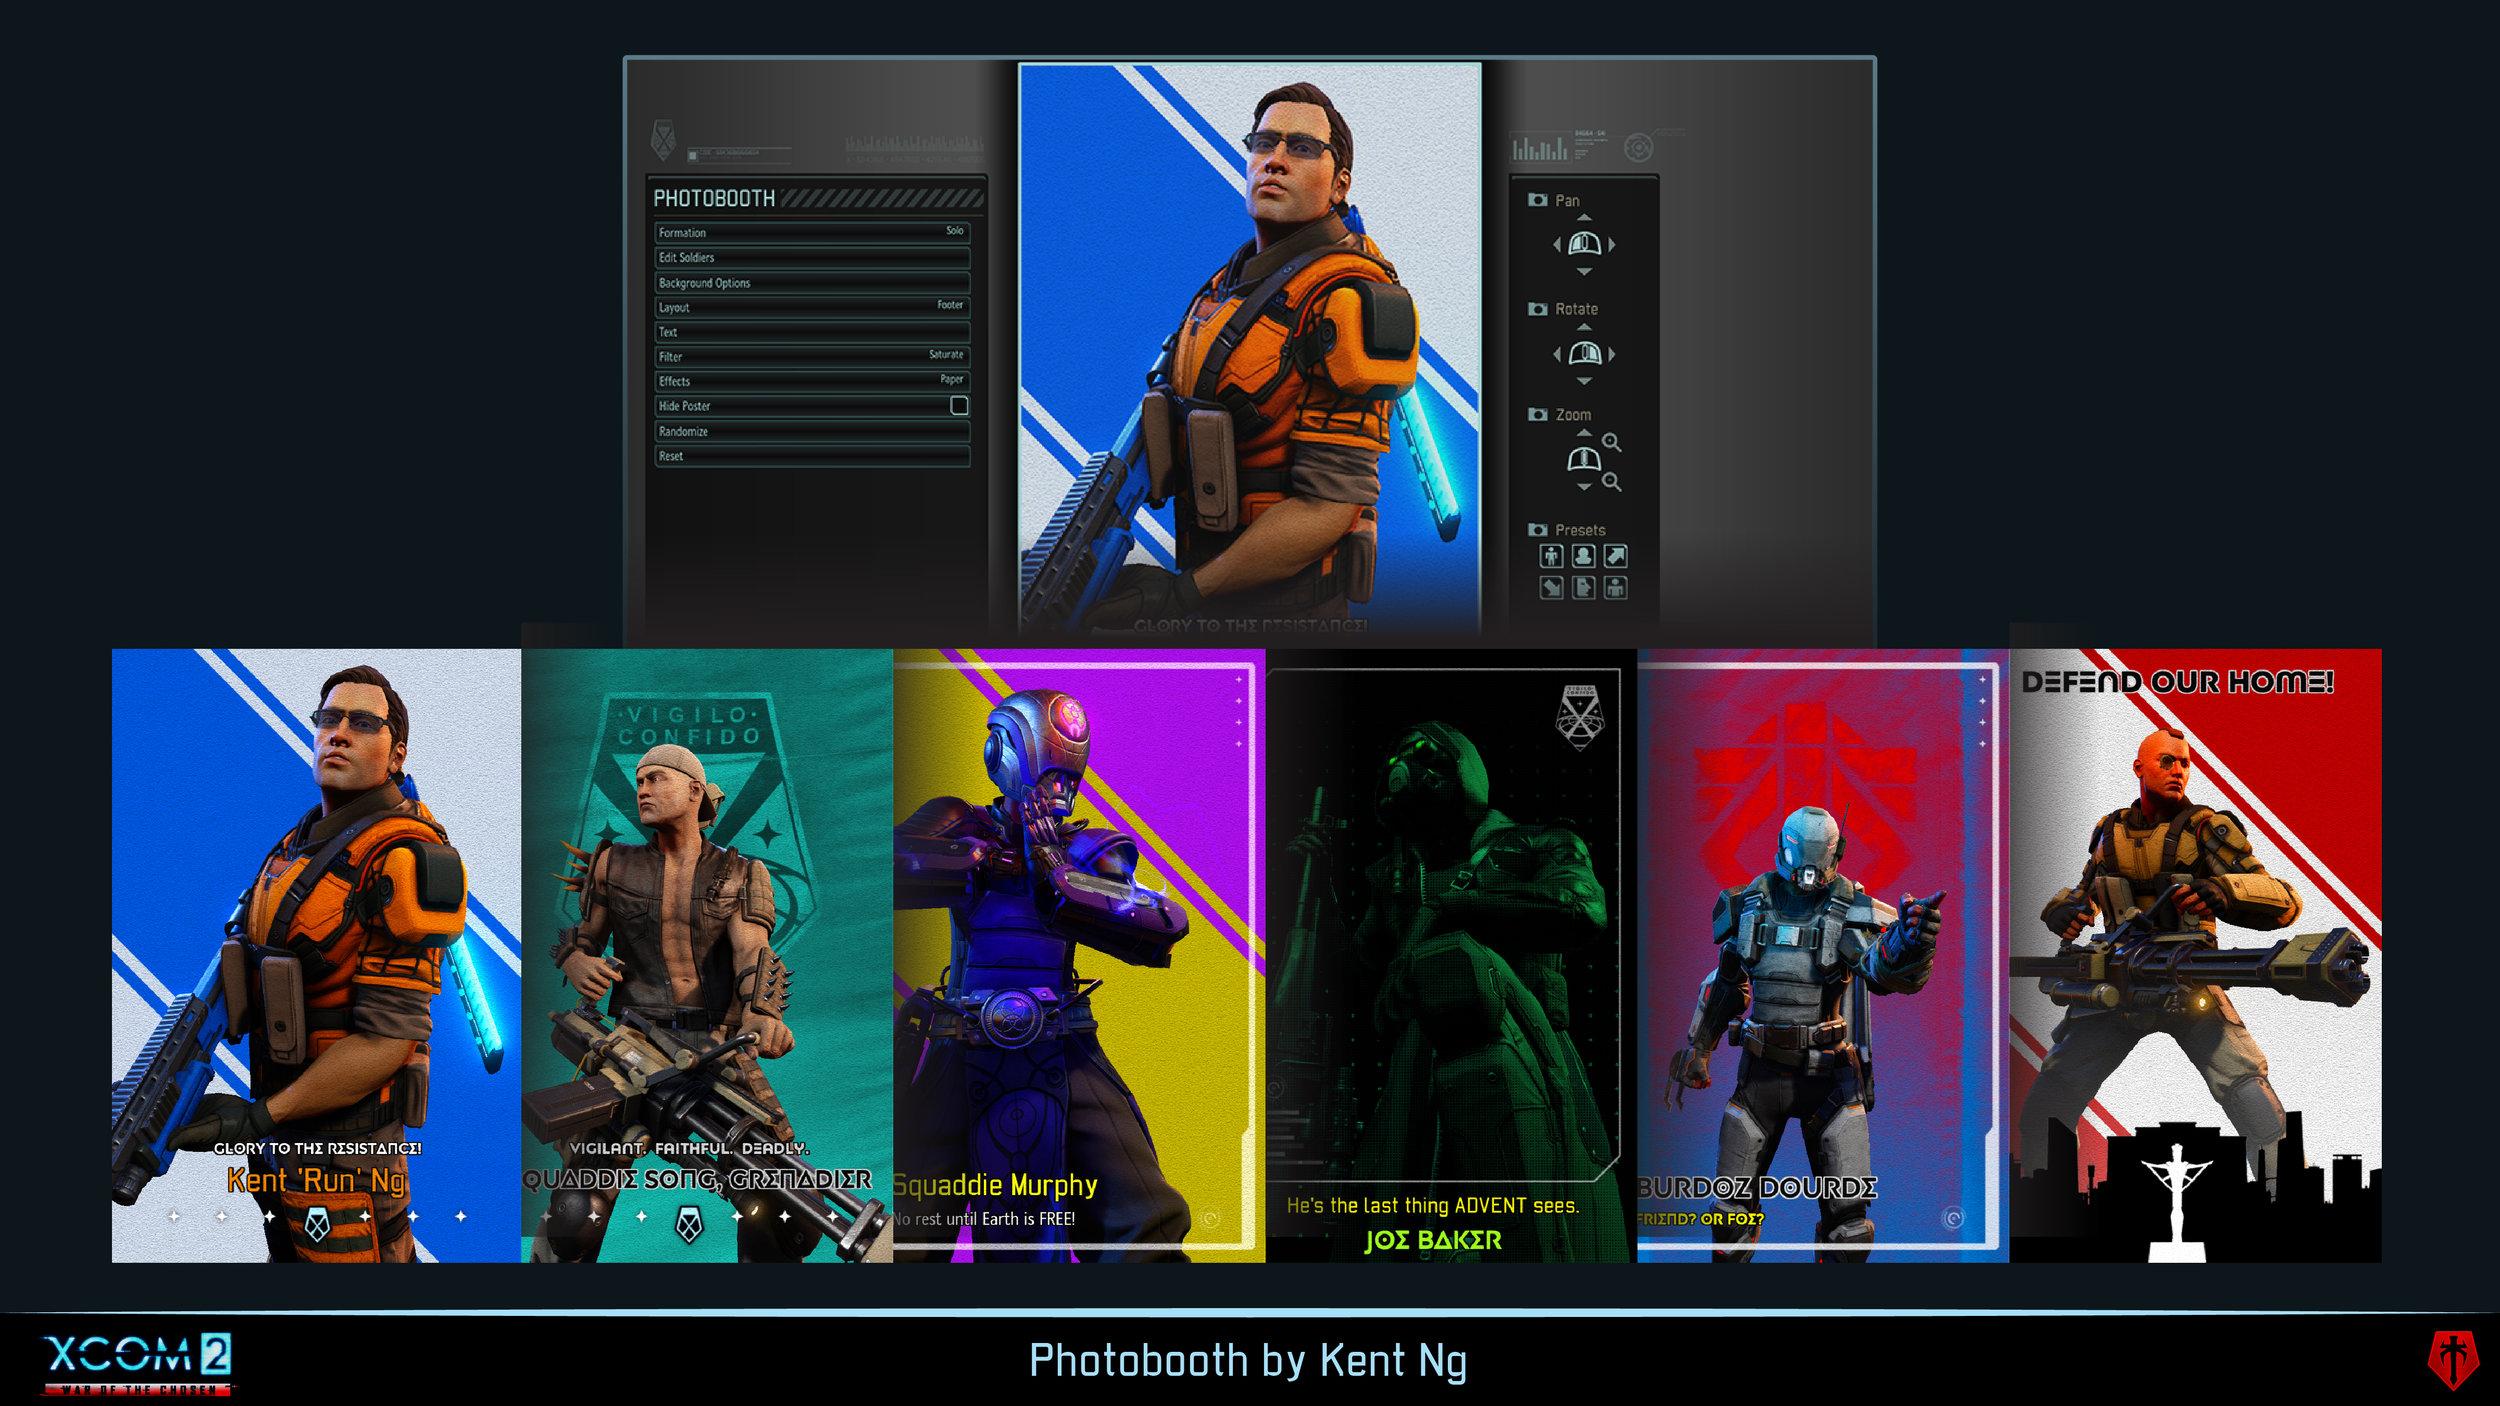 photobooth1.jpg